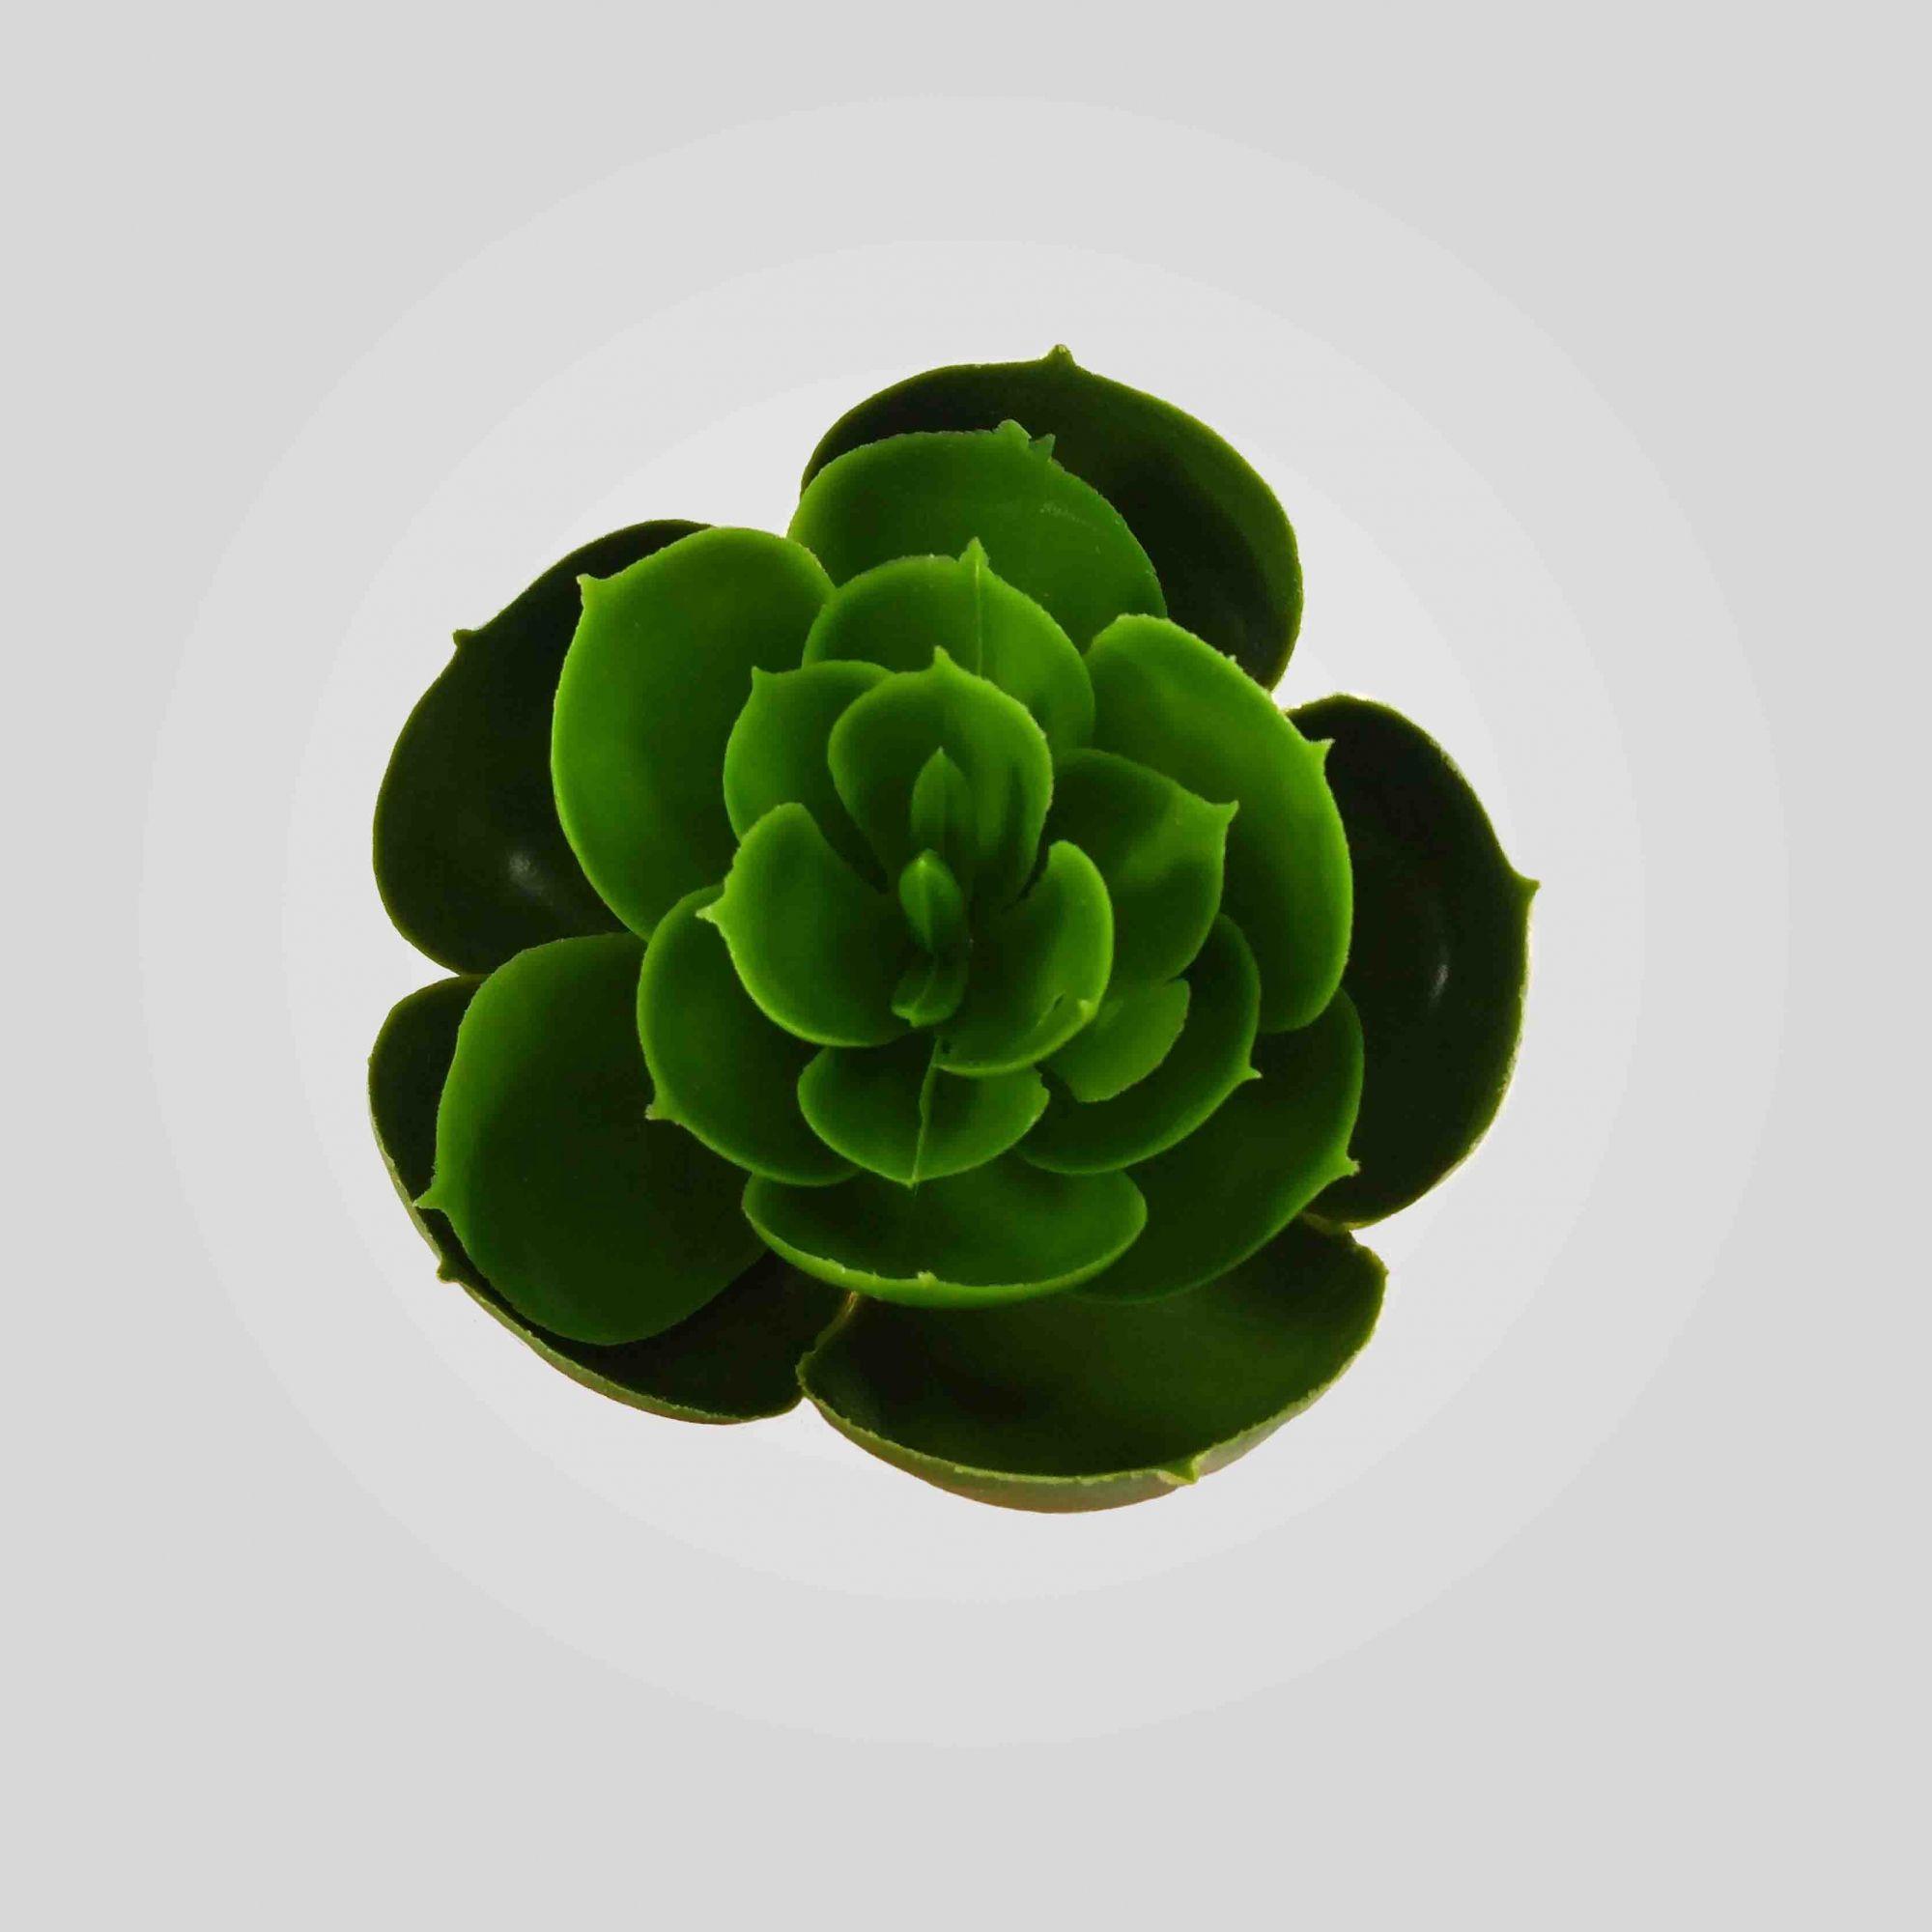 Flor Suculenta Cor Verde Artificial Permanente 5CM 36426-001